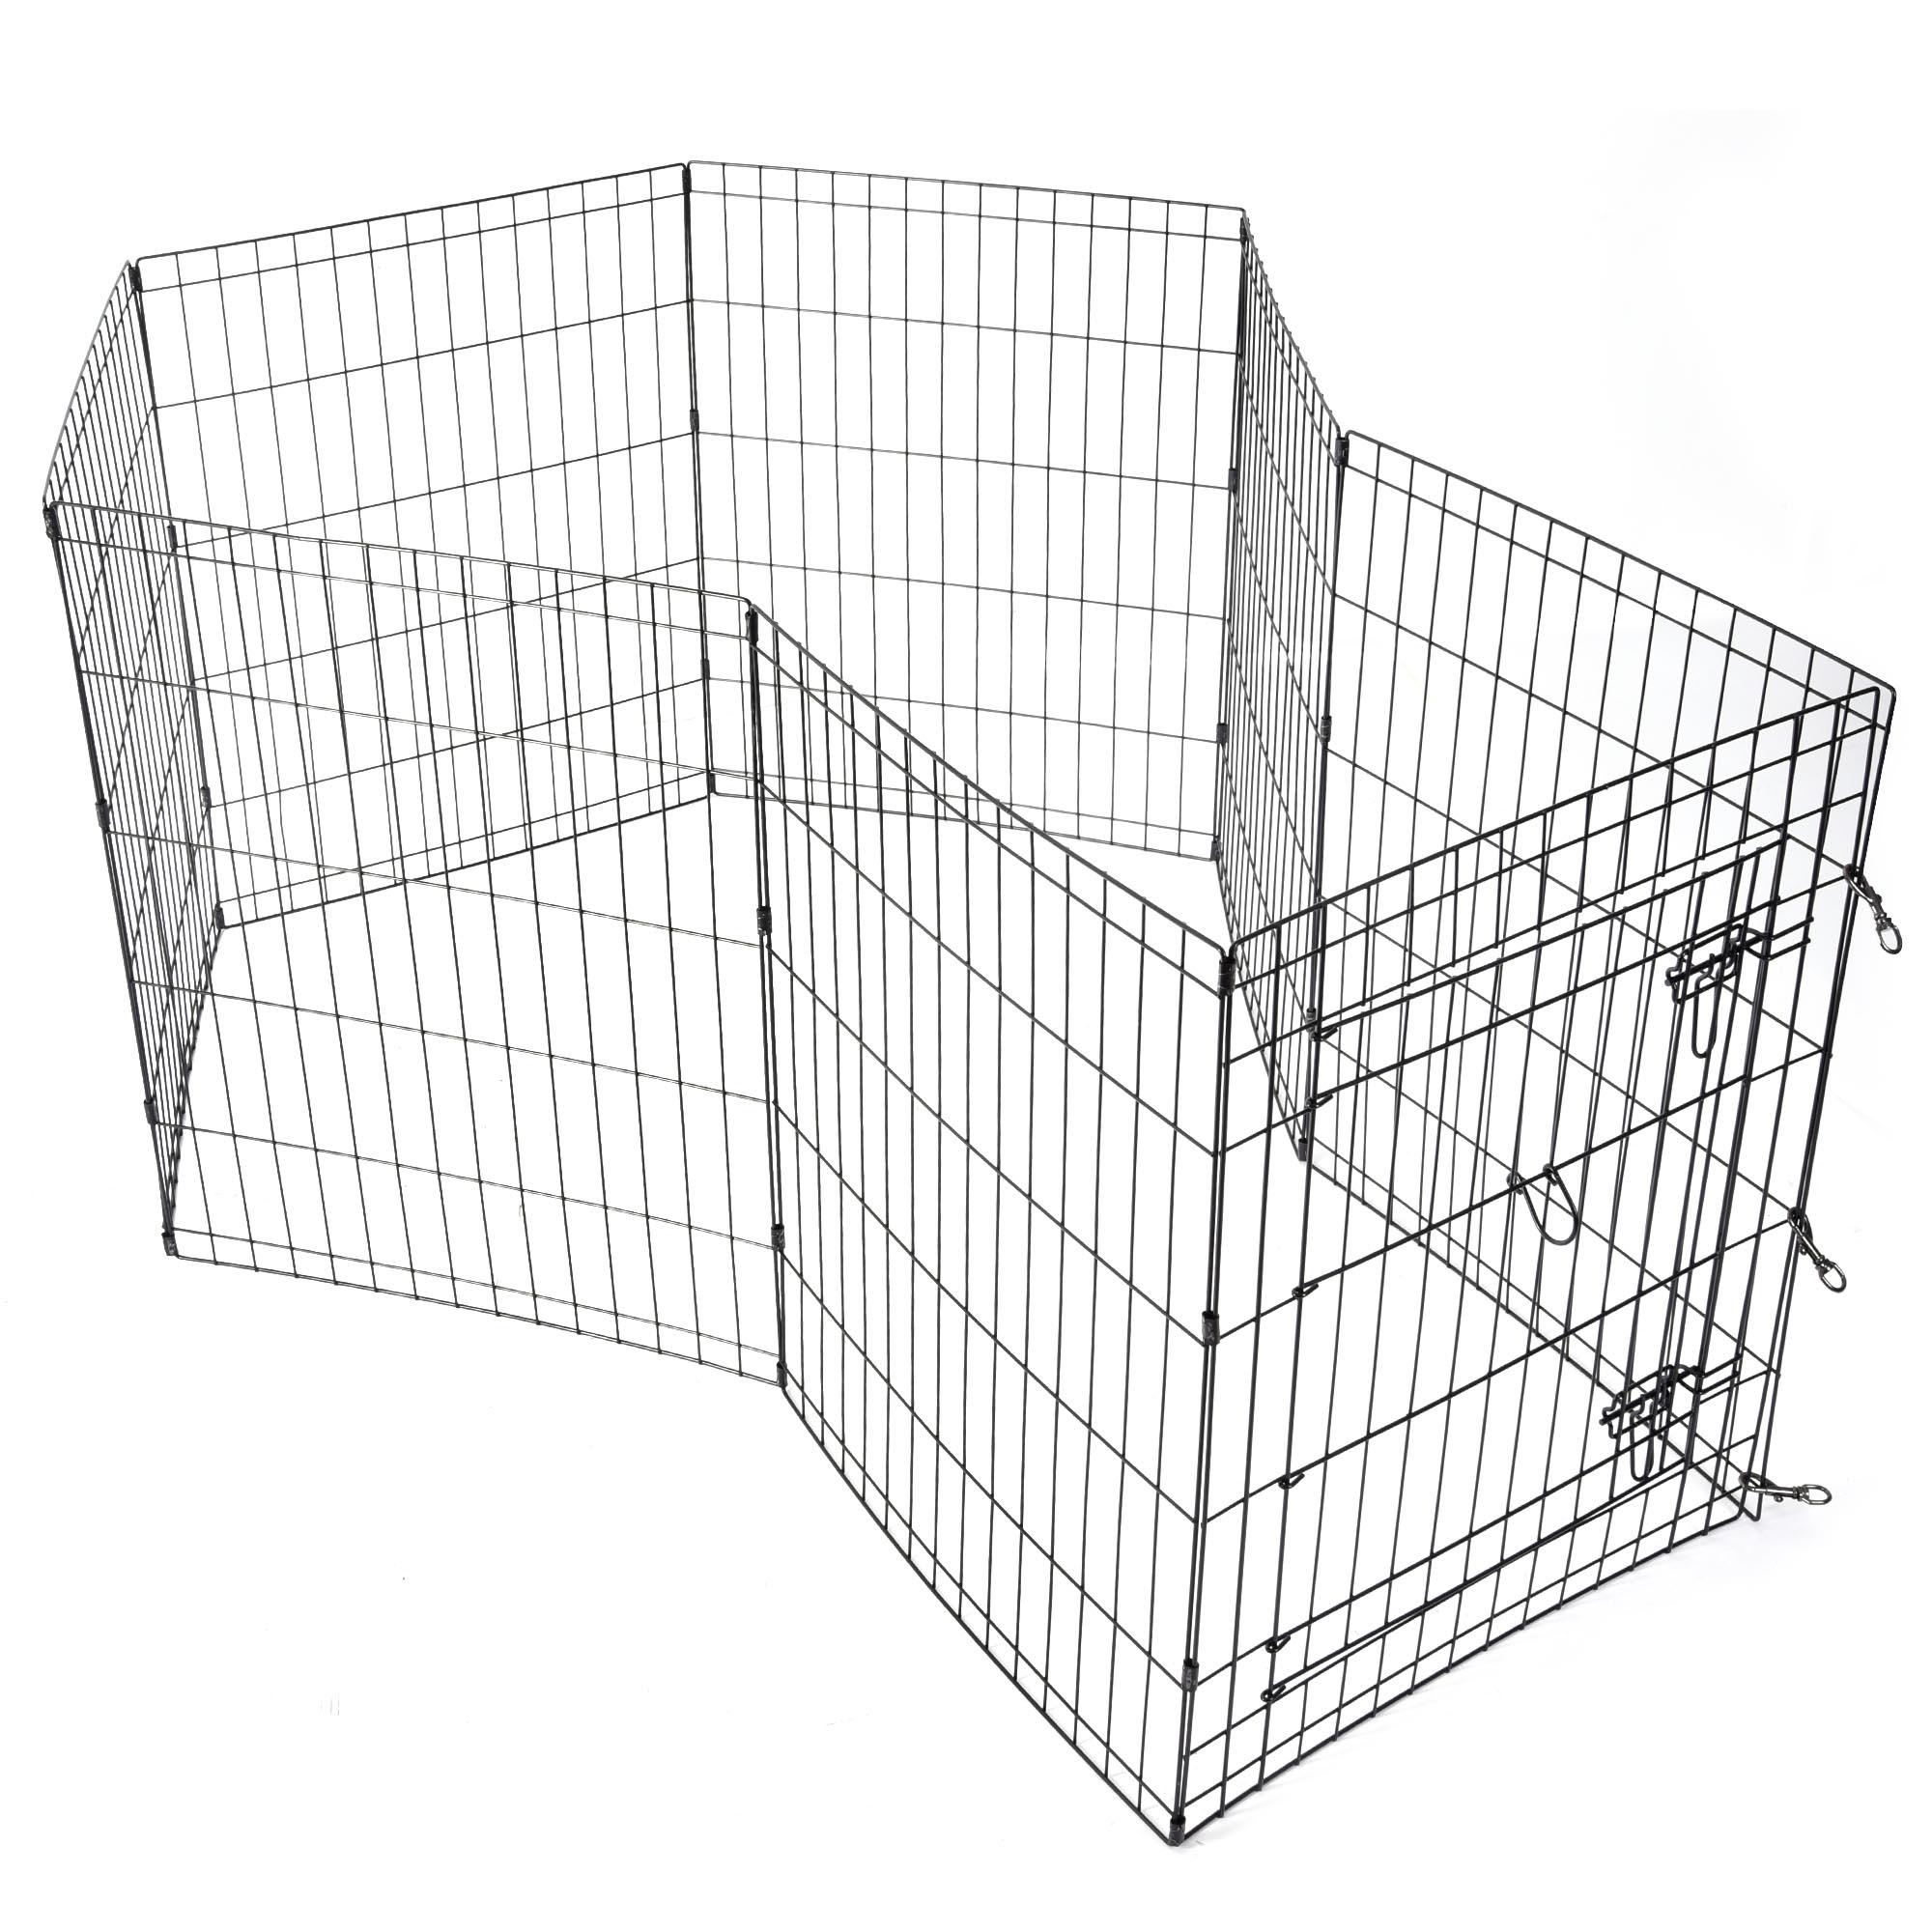 24 30 36 42 48 Dog Playpen Metal Wire Crate Pet Puppy